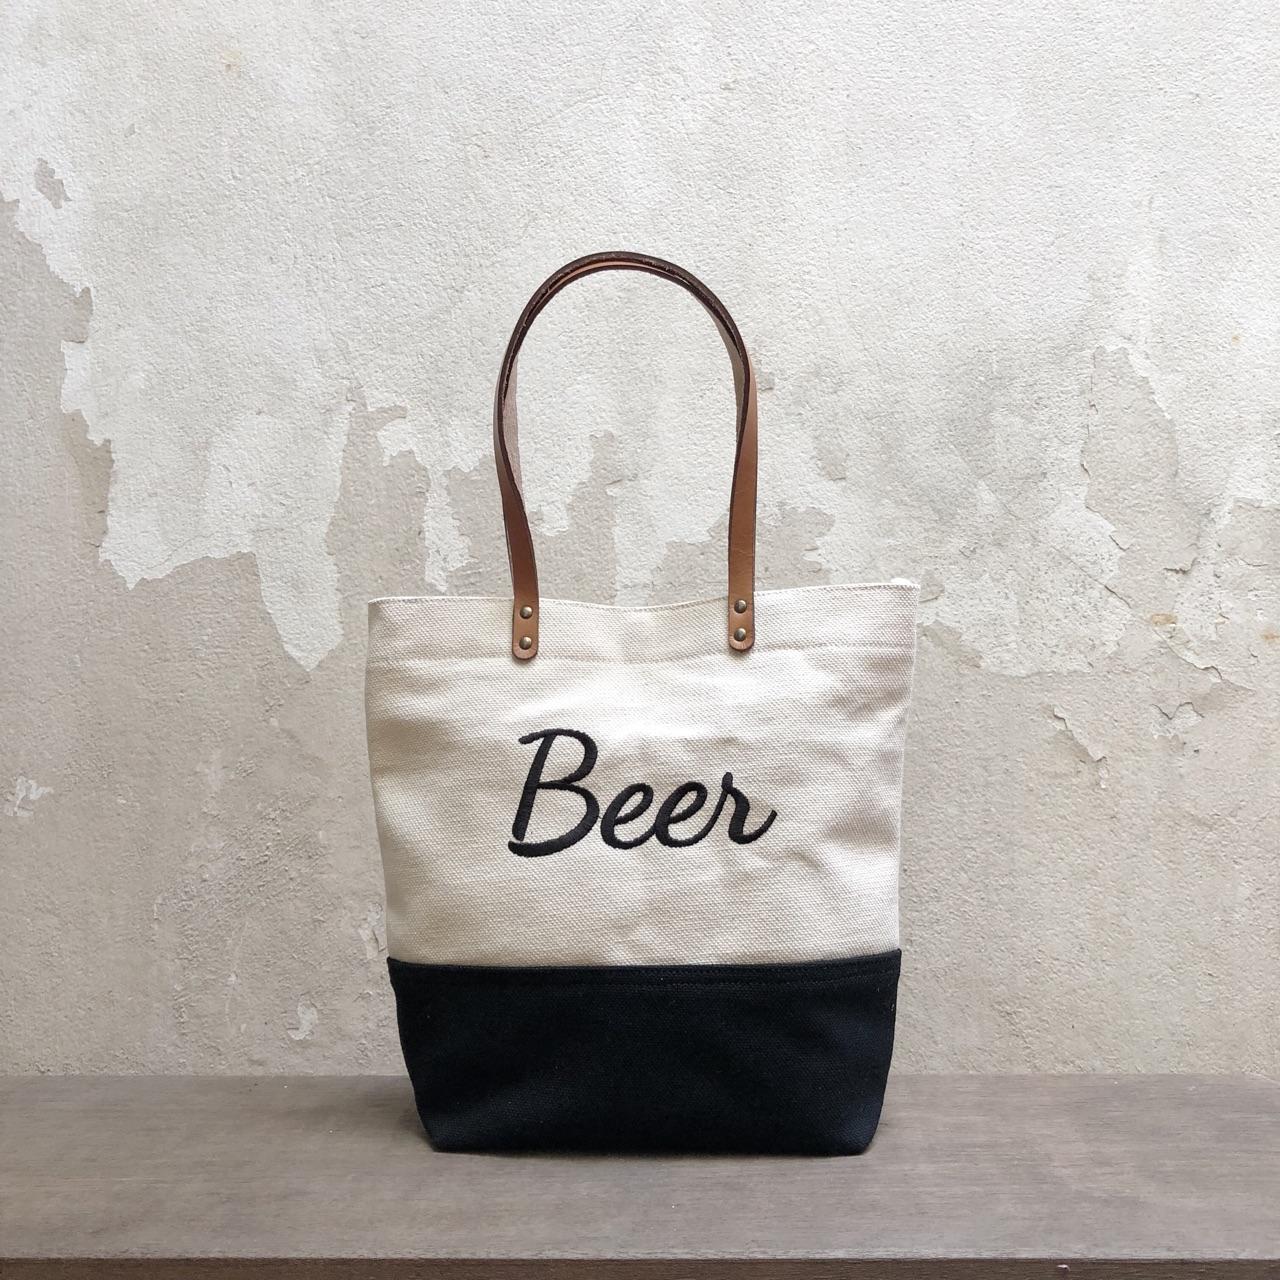 madetoorder,Lapindesigns,totebag,bag,handbag,TwoTone,canvas,canvasbag,แคนวาส